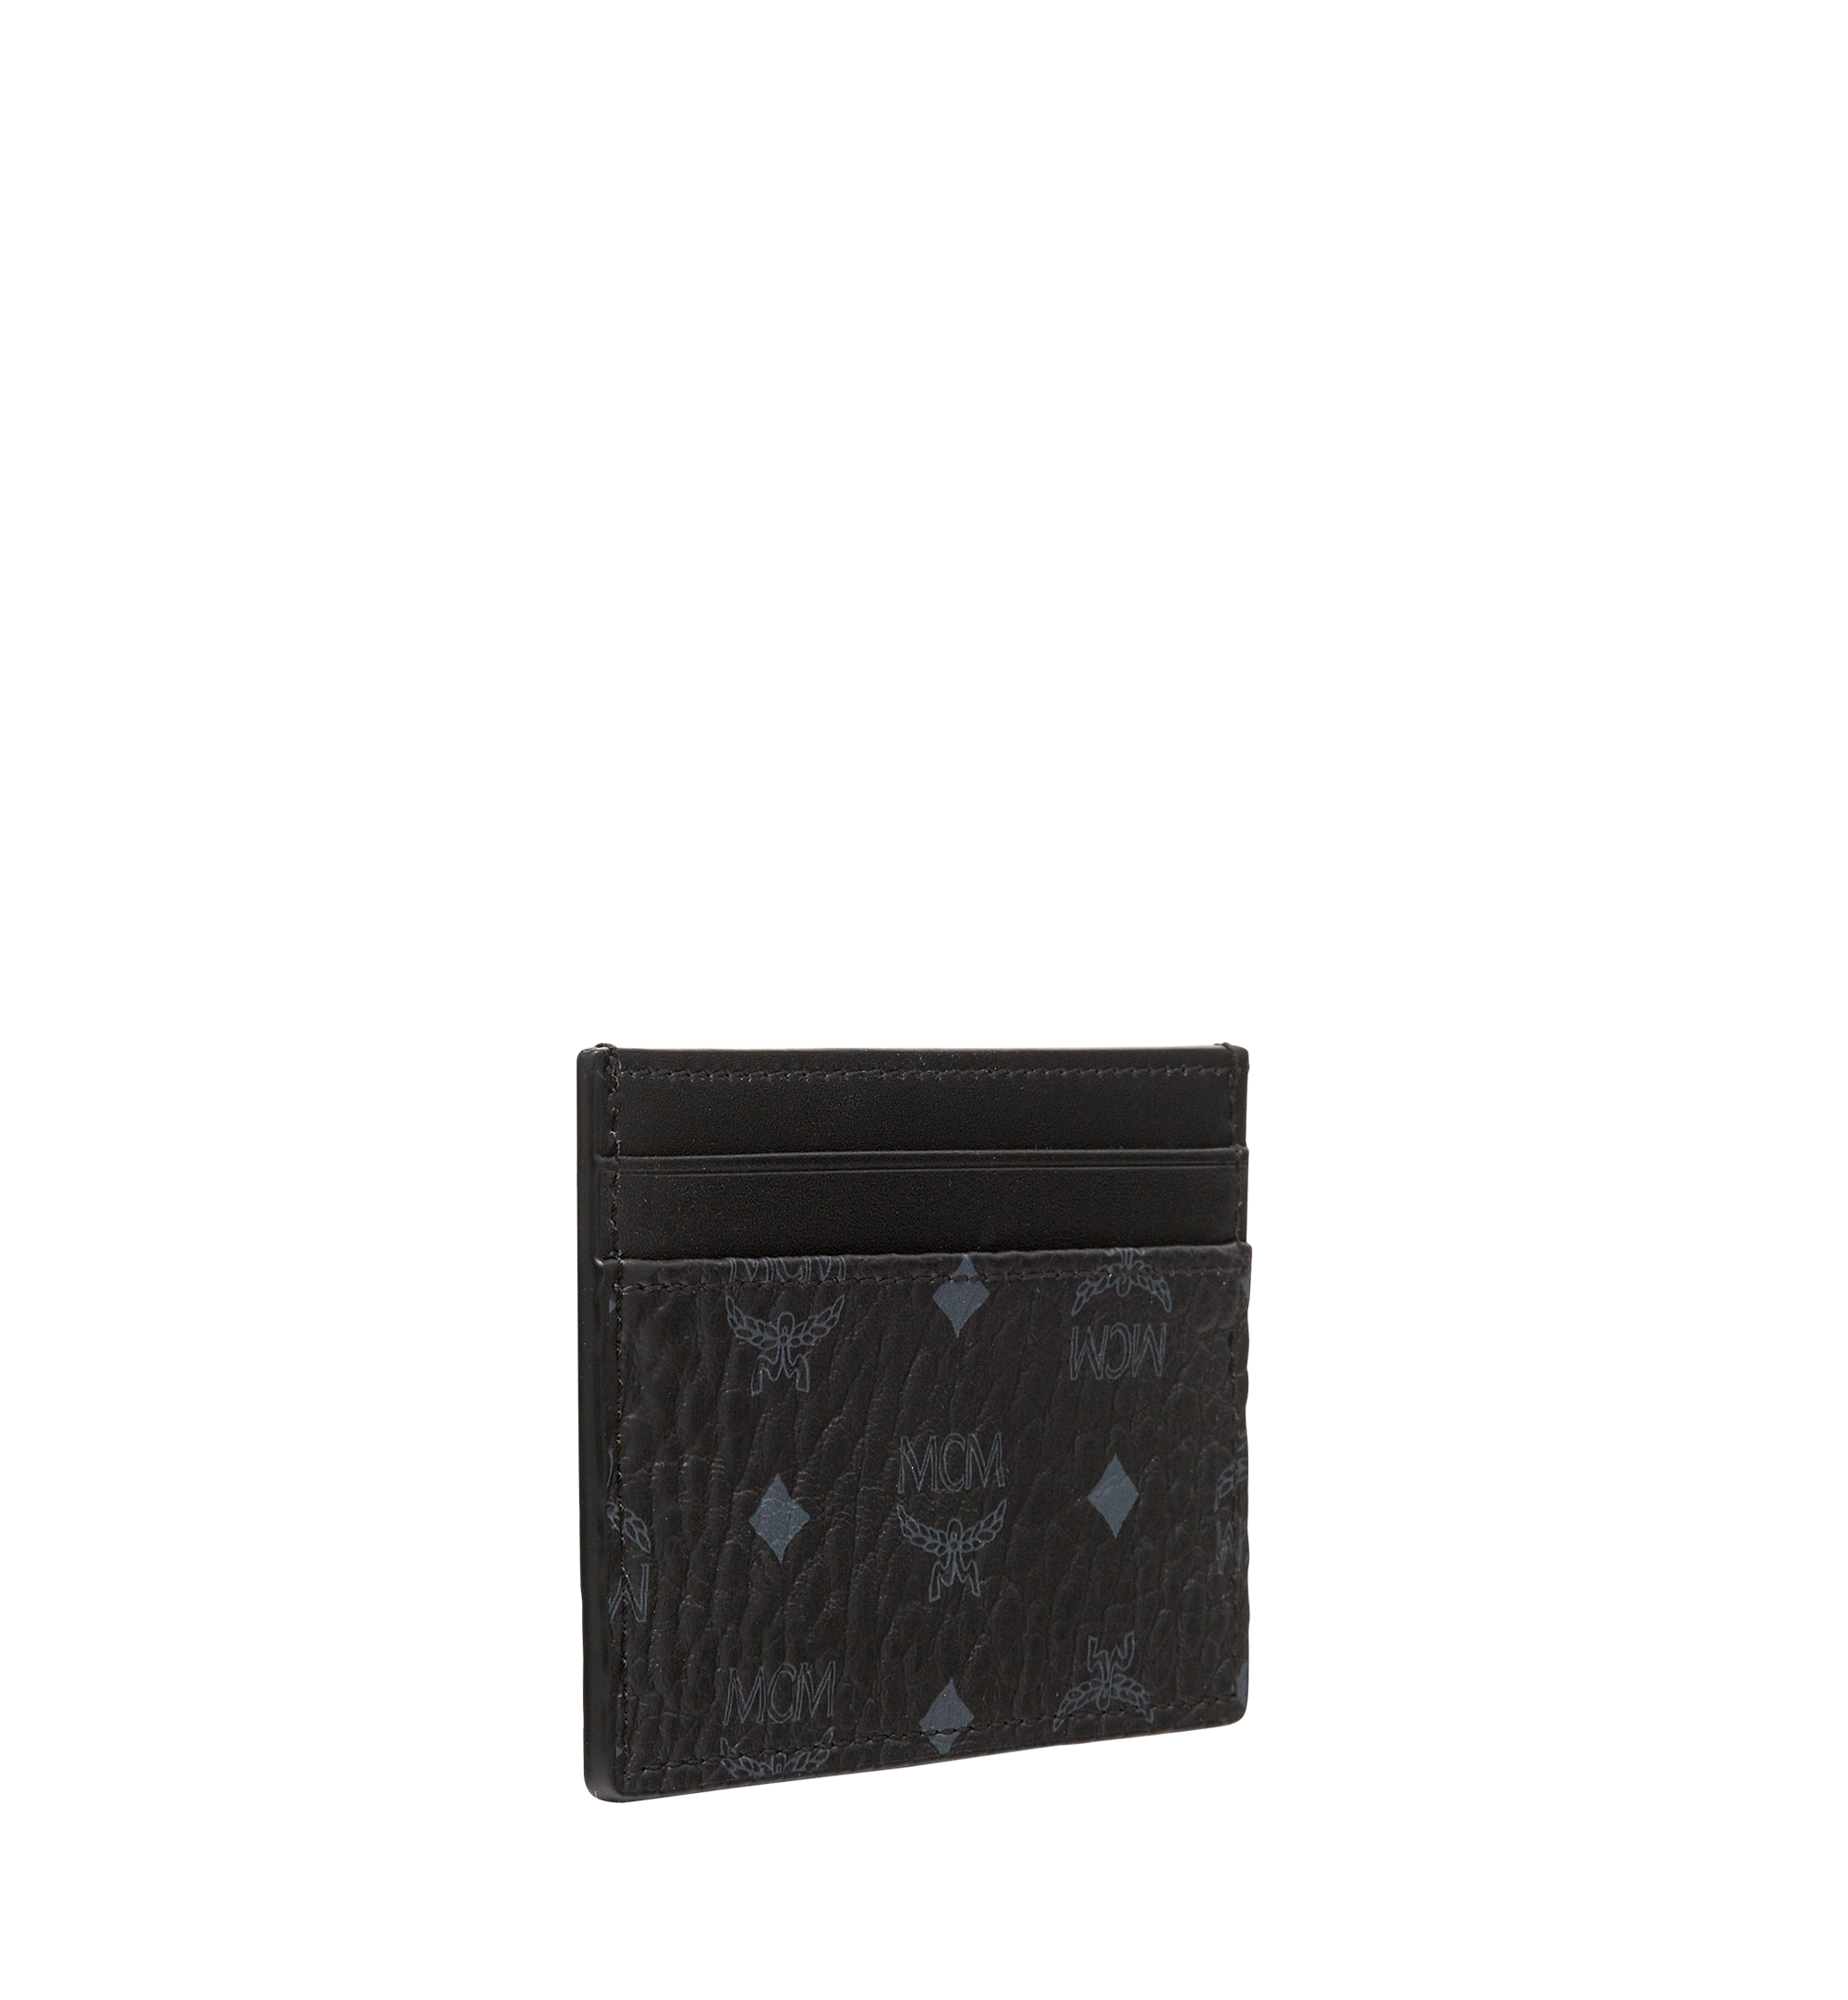 MCM Visetos 經典卡夾 Black MXA8SVI26BK001 更多視圖 1